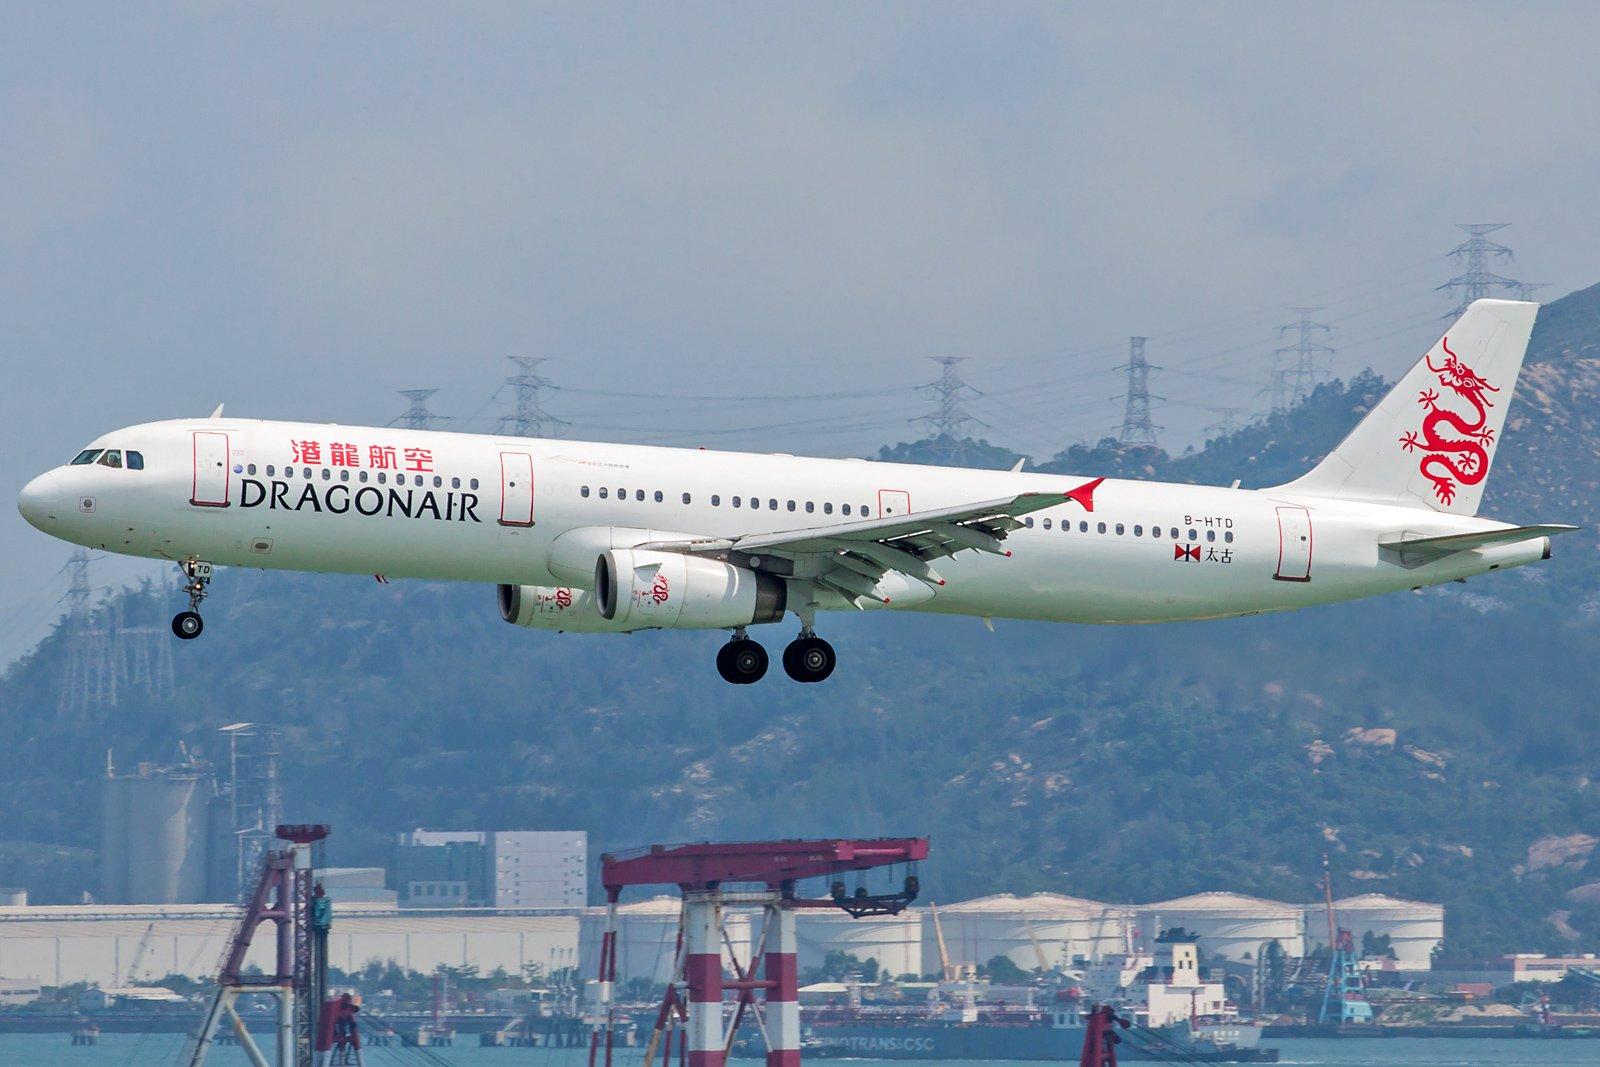 Dragonair (Cathay Dragon) Airbus A321-231 B-HTD